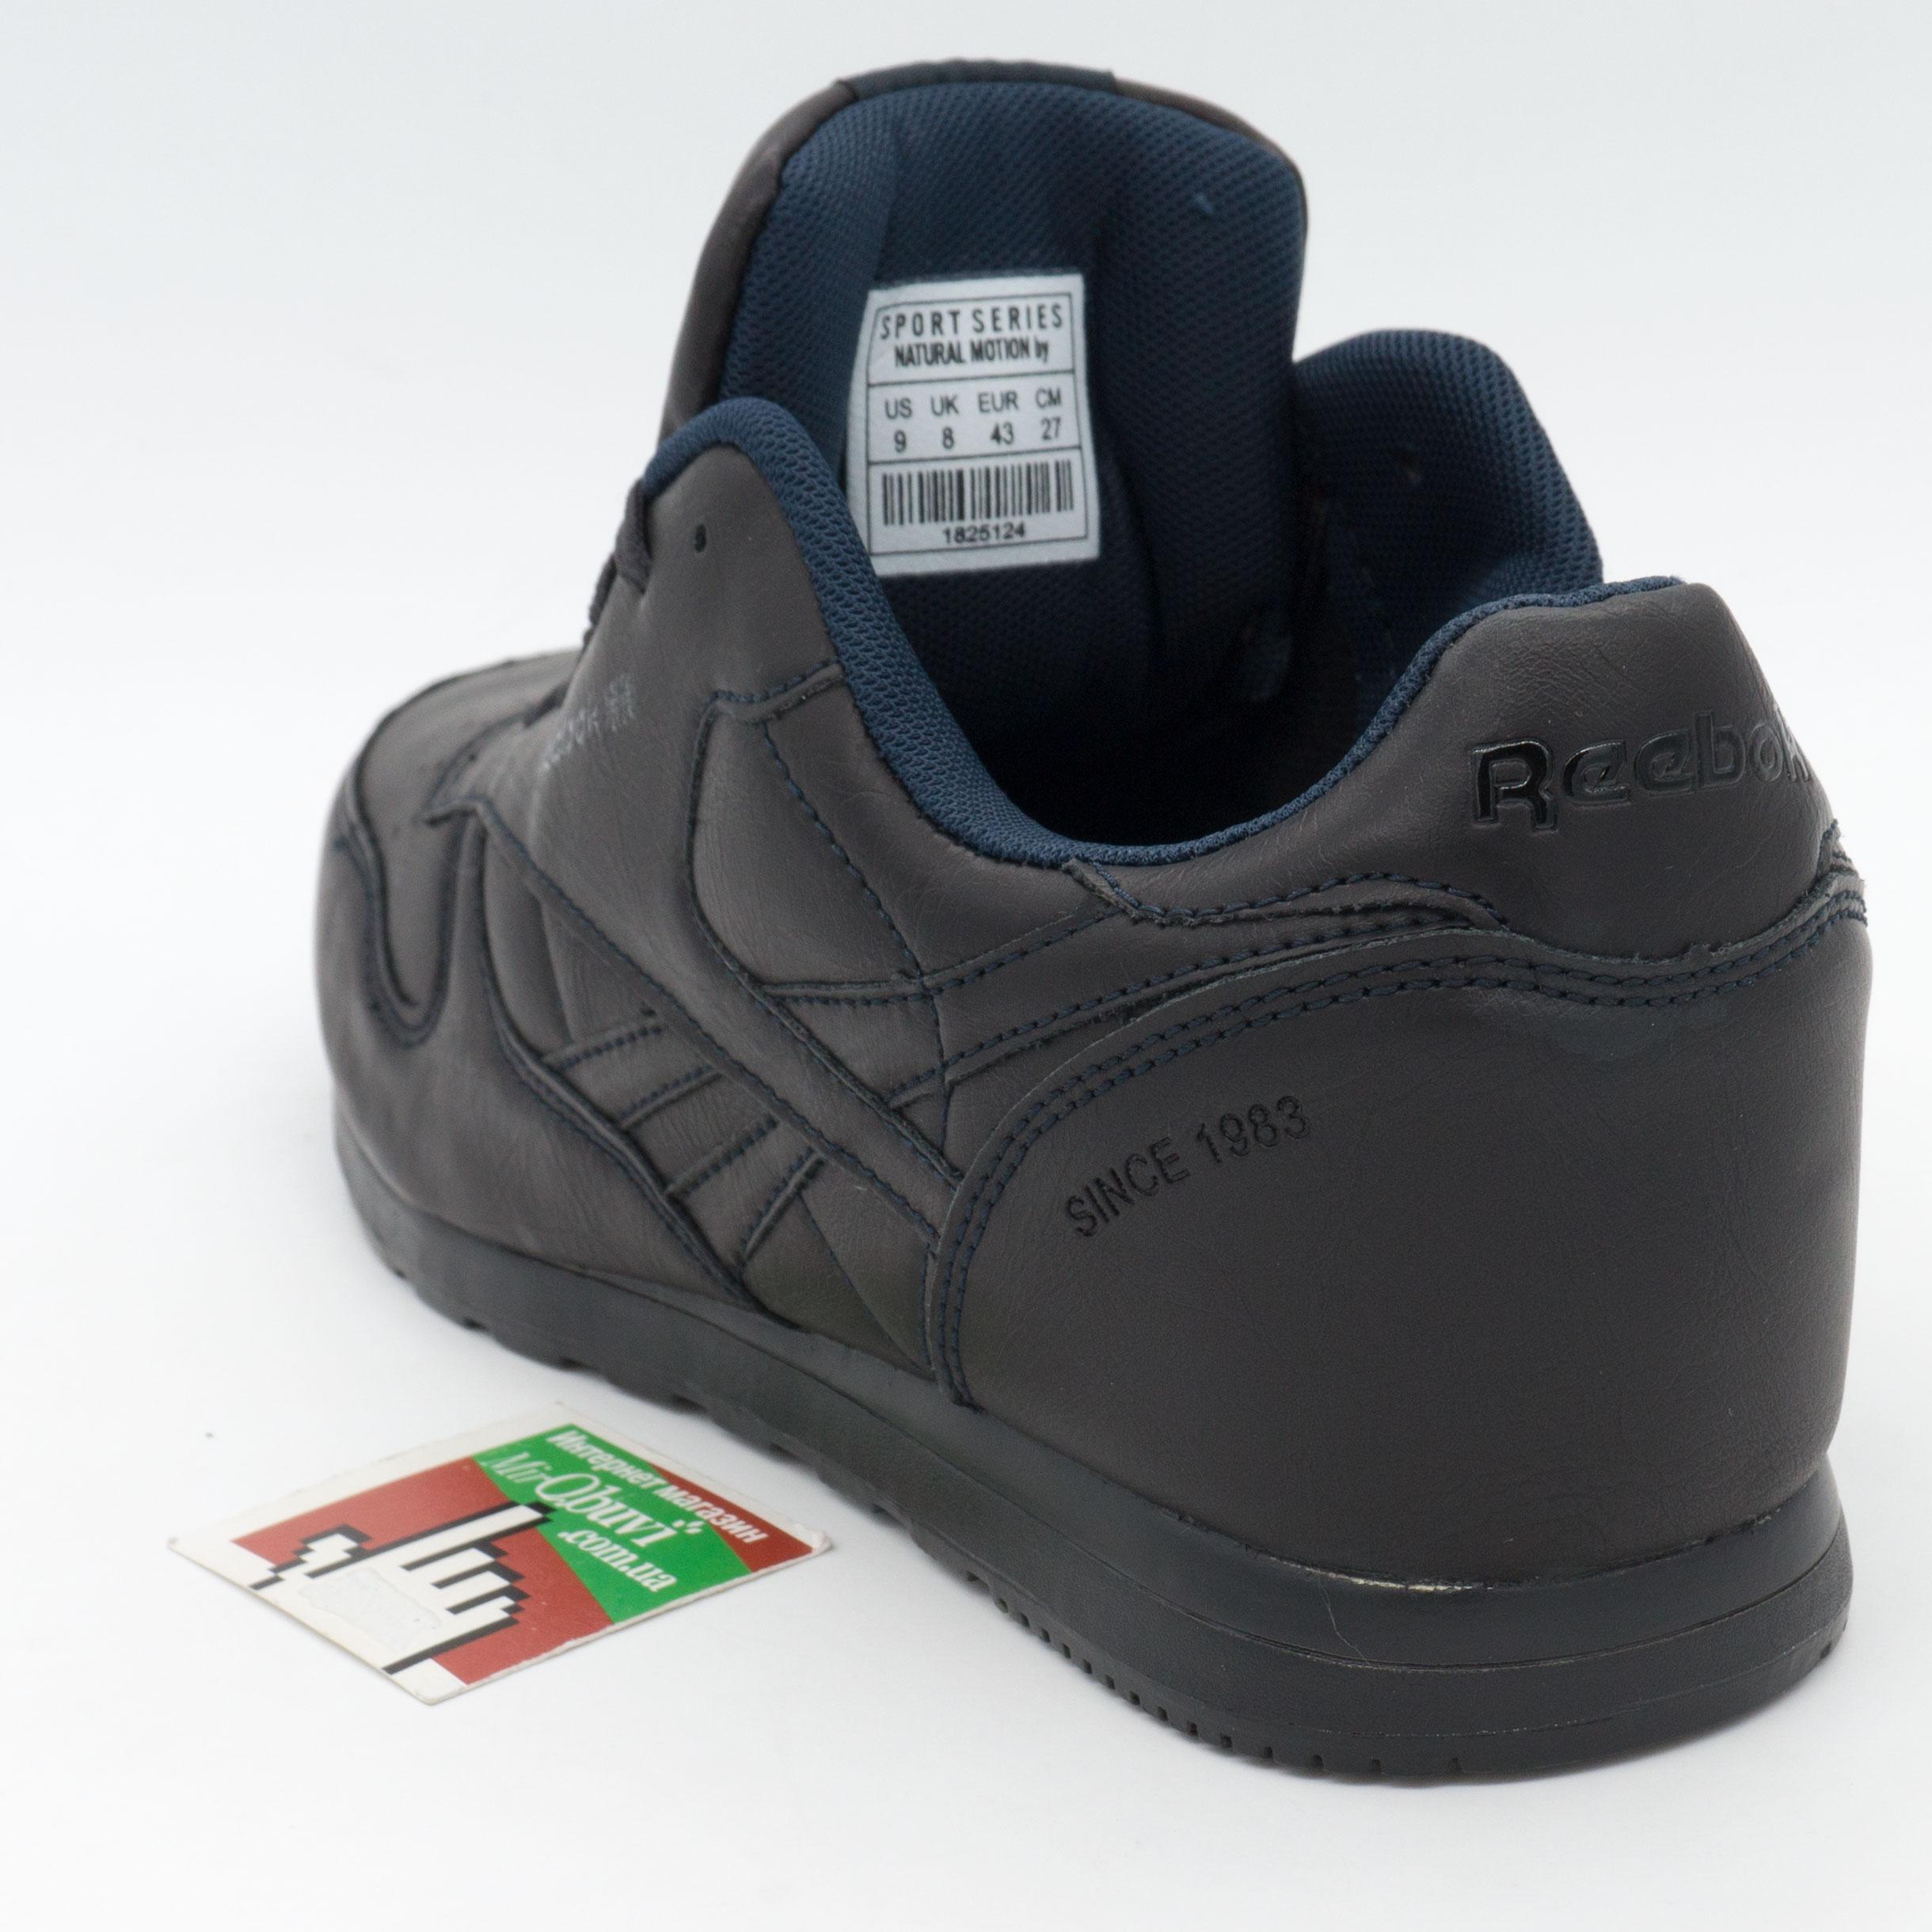 фото back Мужские кожаные кроссовки Reebok classic dark blue (Рибок класик темно синие, кожа) back